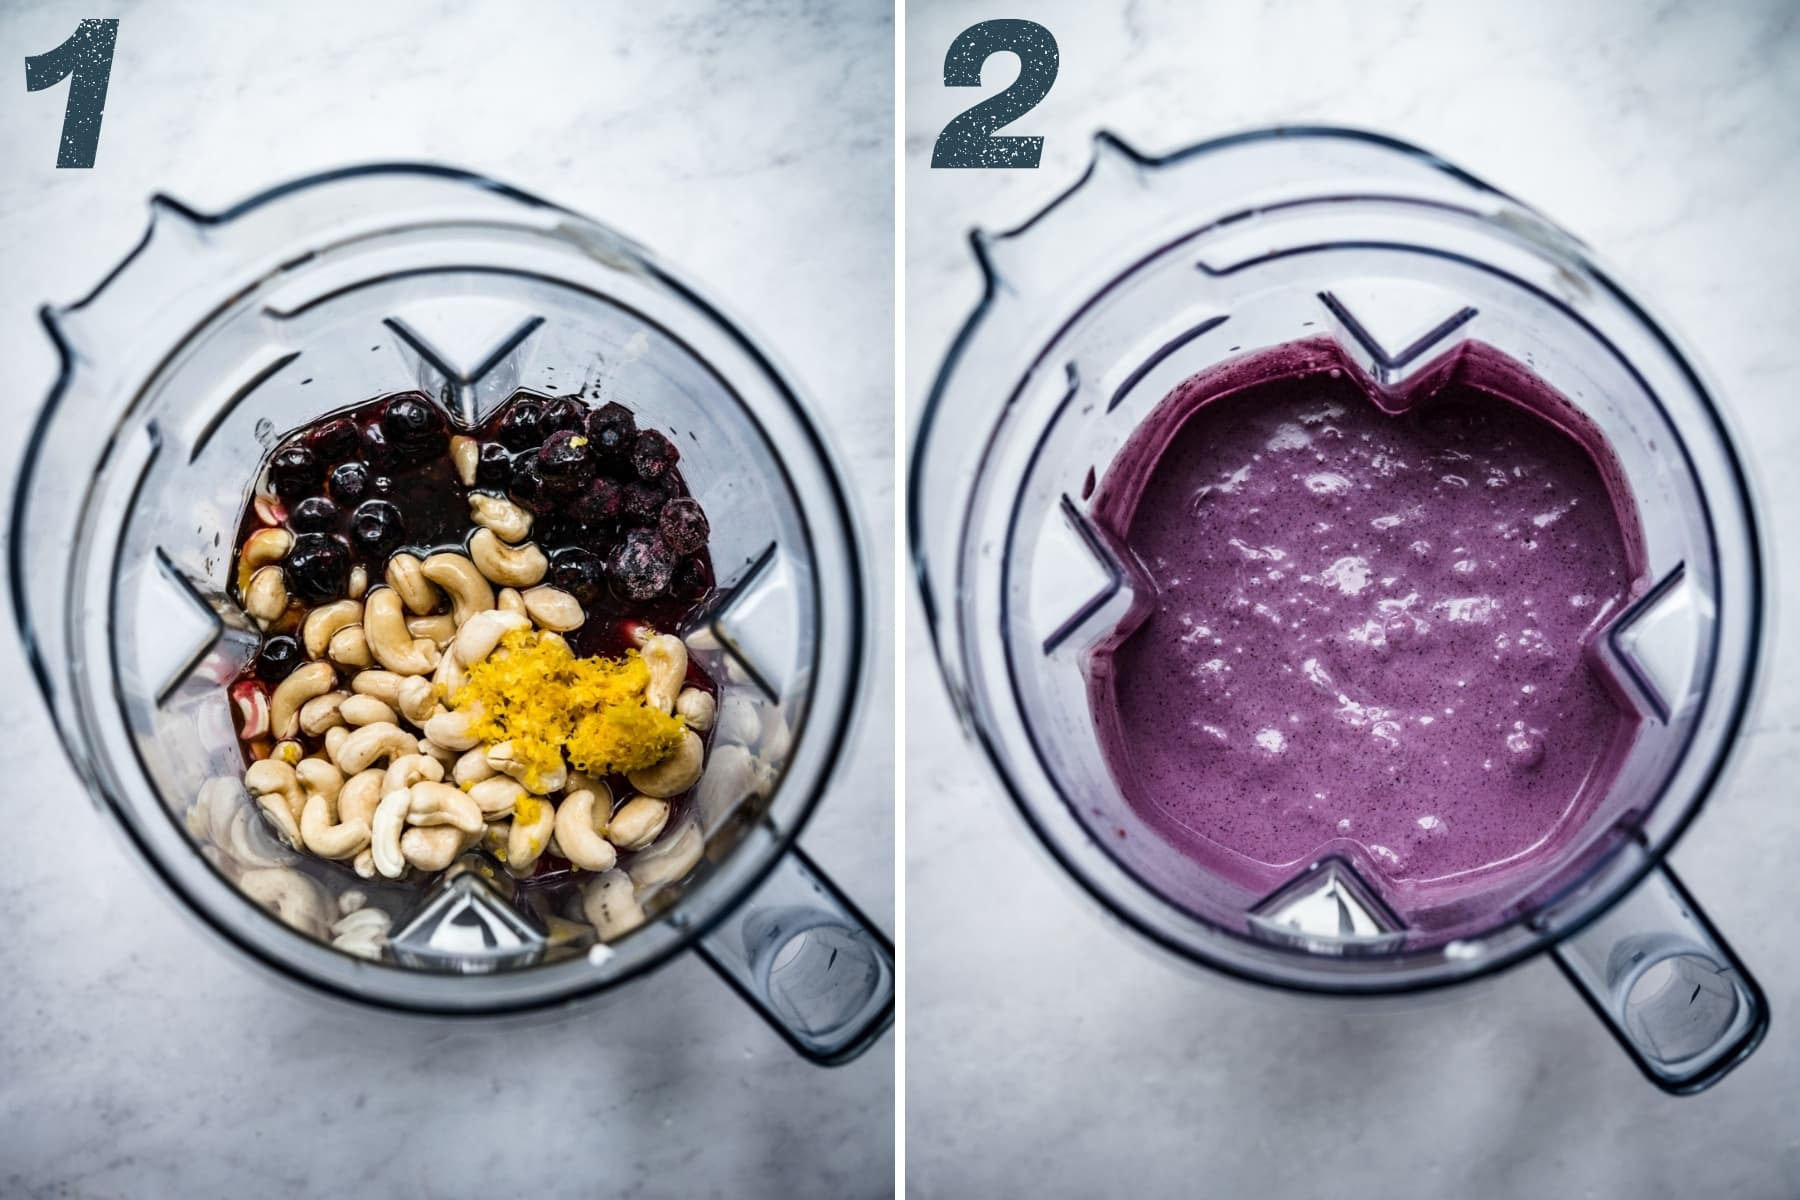 before and after blending ingredients for vegan blueberry lemon ice cream in blender.